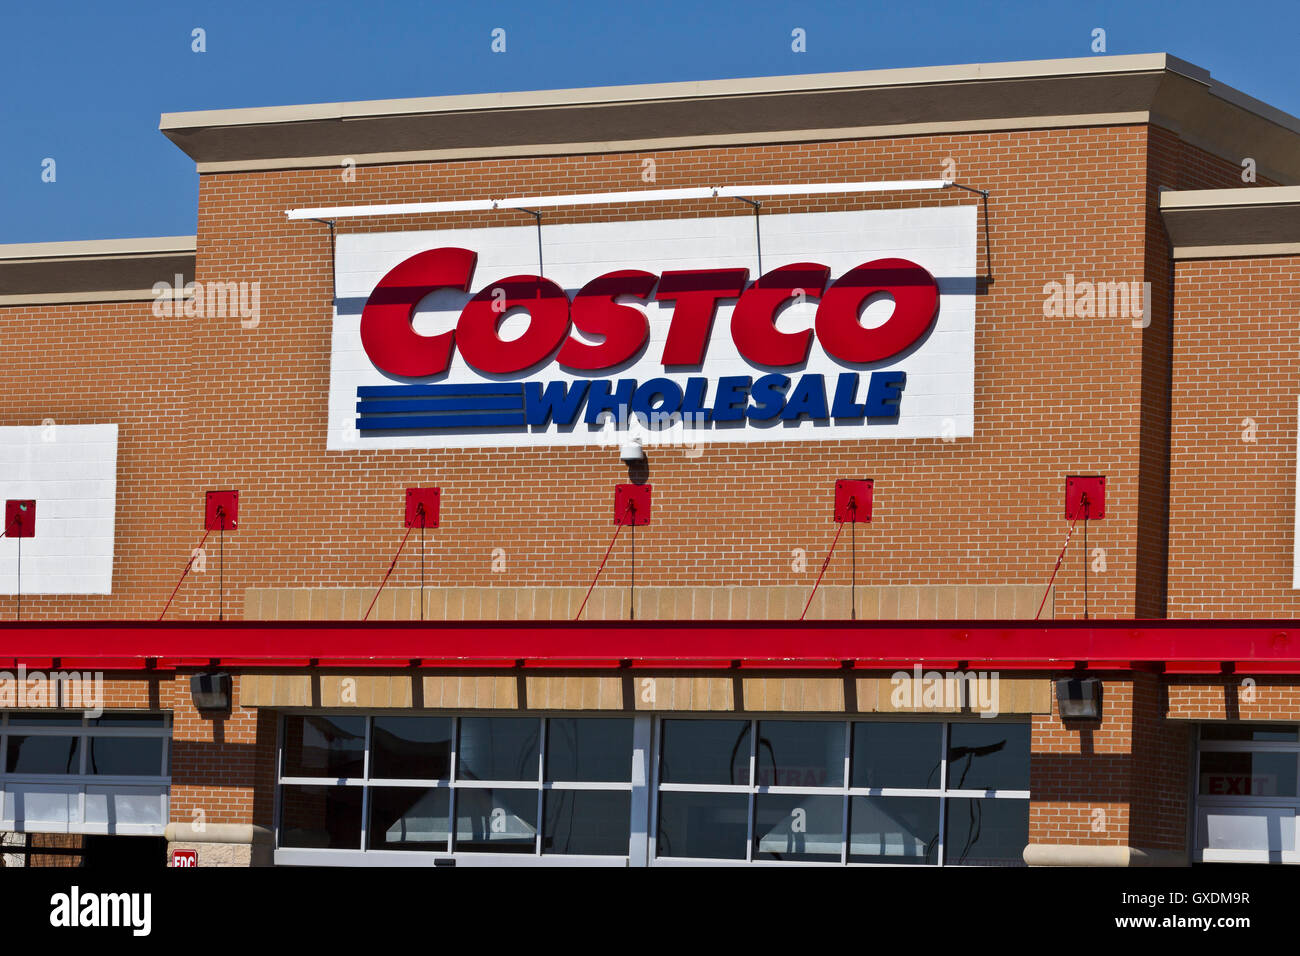 Costco Retail Stock Photos & Costco Retail Stock Images - Alamy